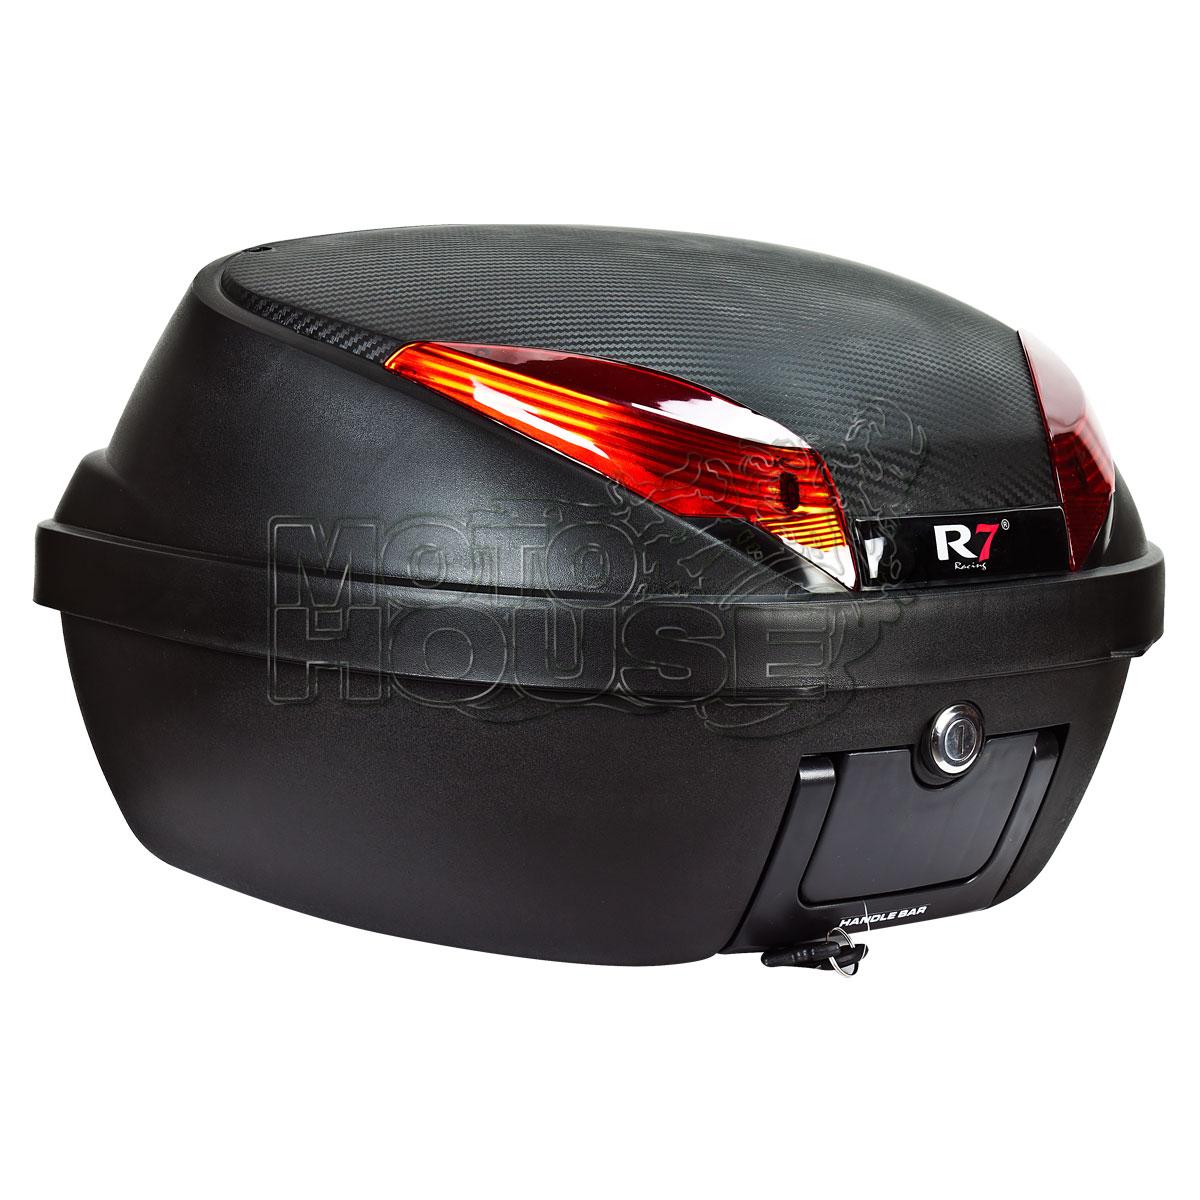 r742lt-1